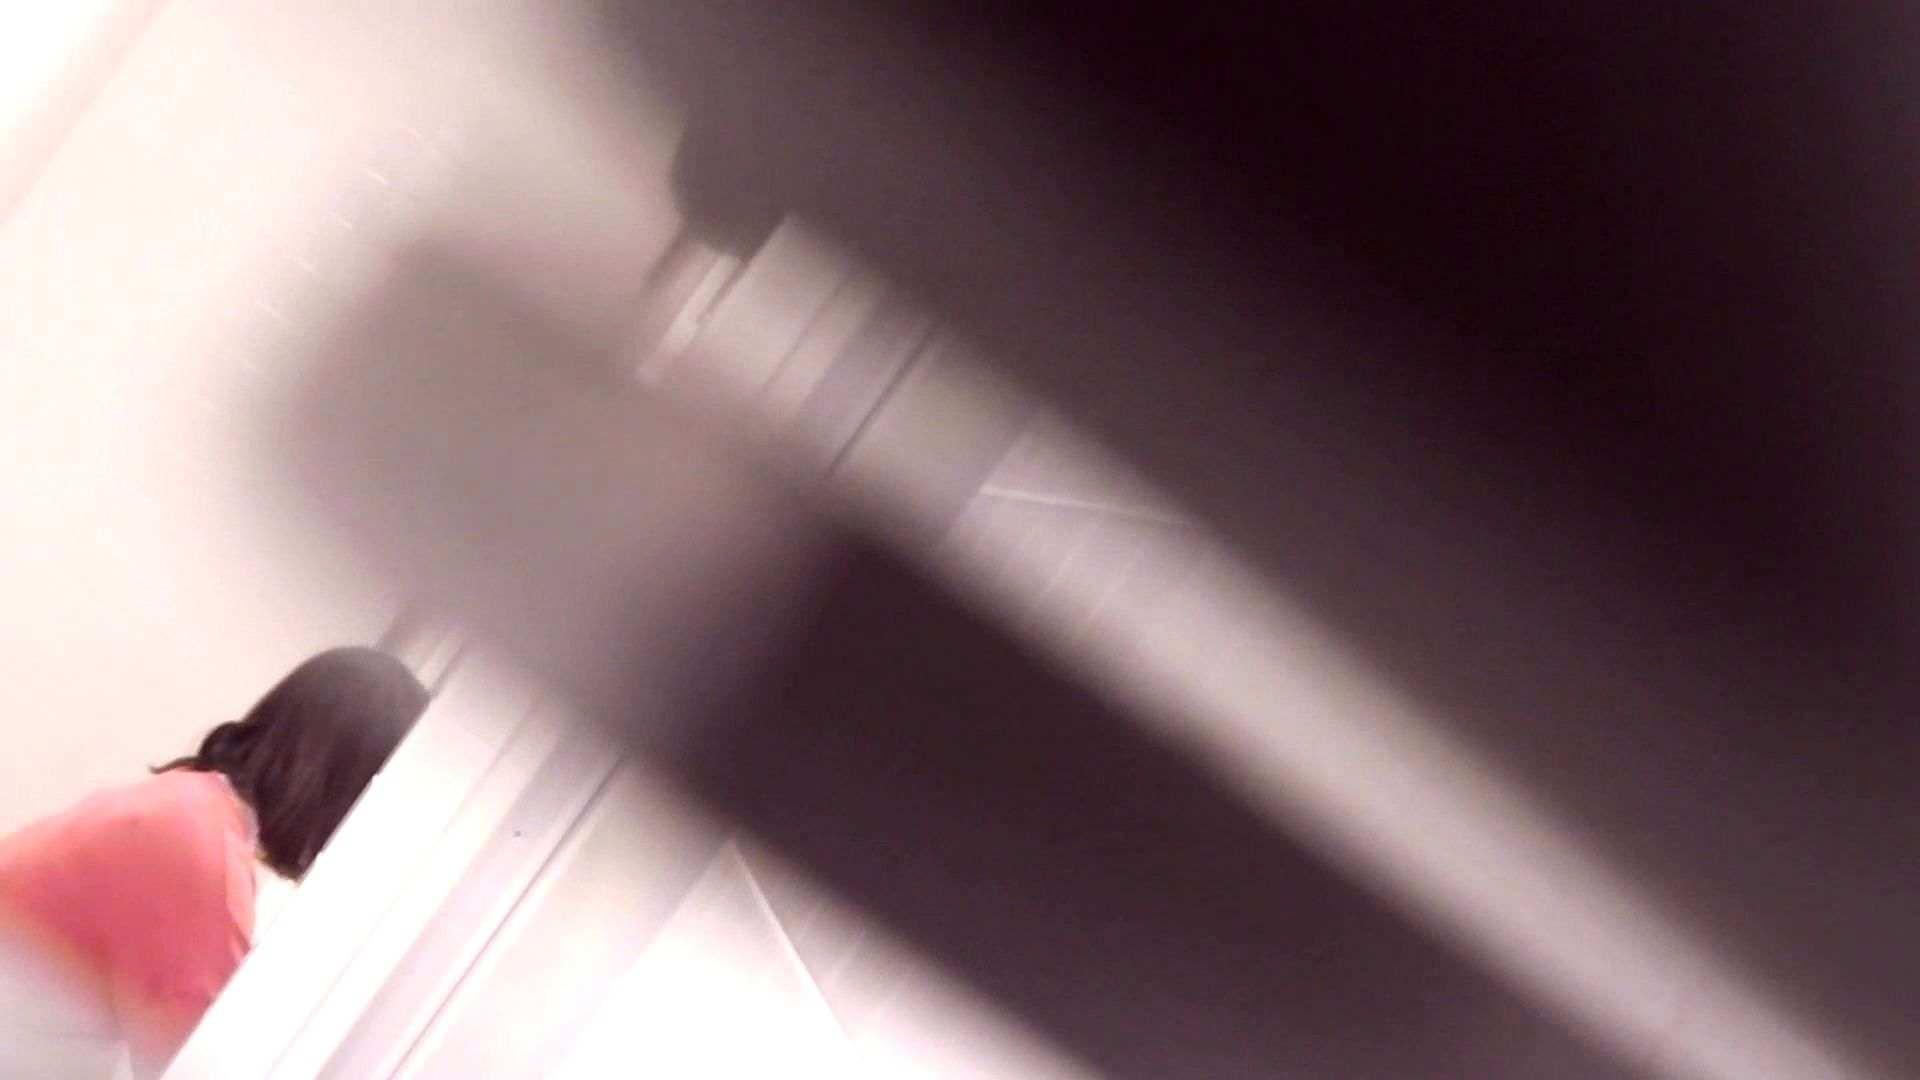 vol.15 命がけ潜伏洗面所! 肌荒れ注意報!! プライベート 濡れ場動画紹介 89画像 71